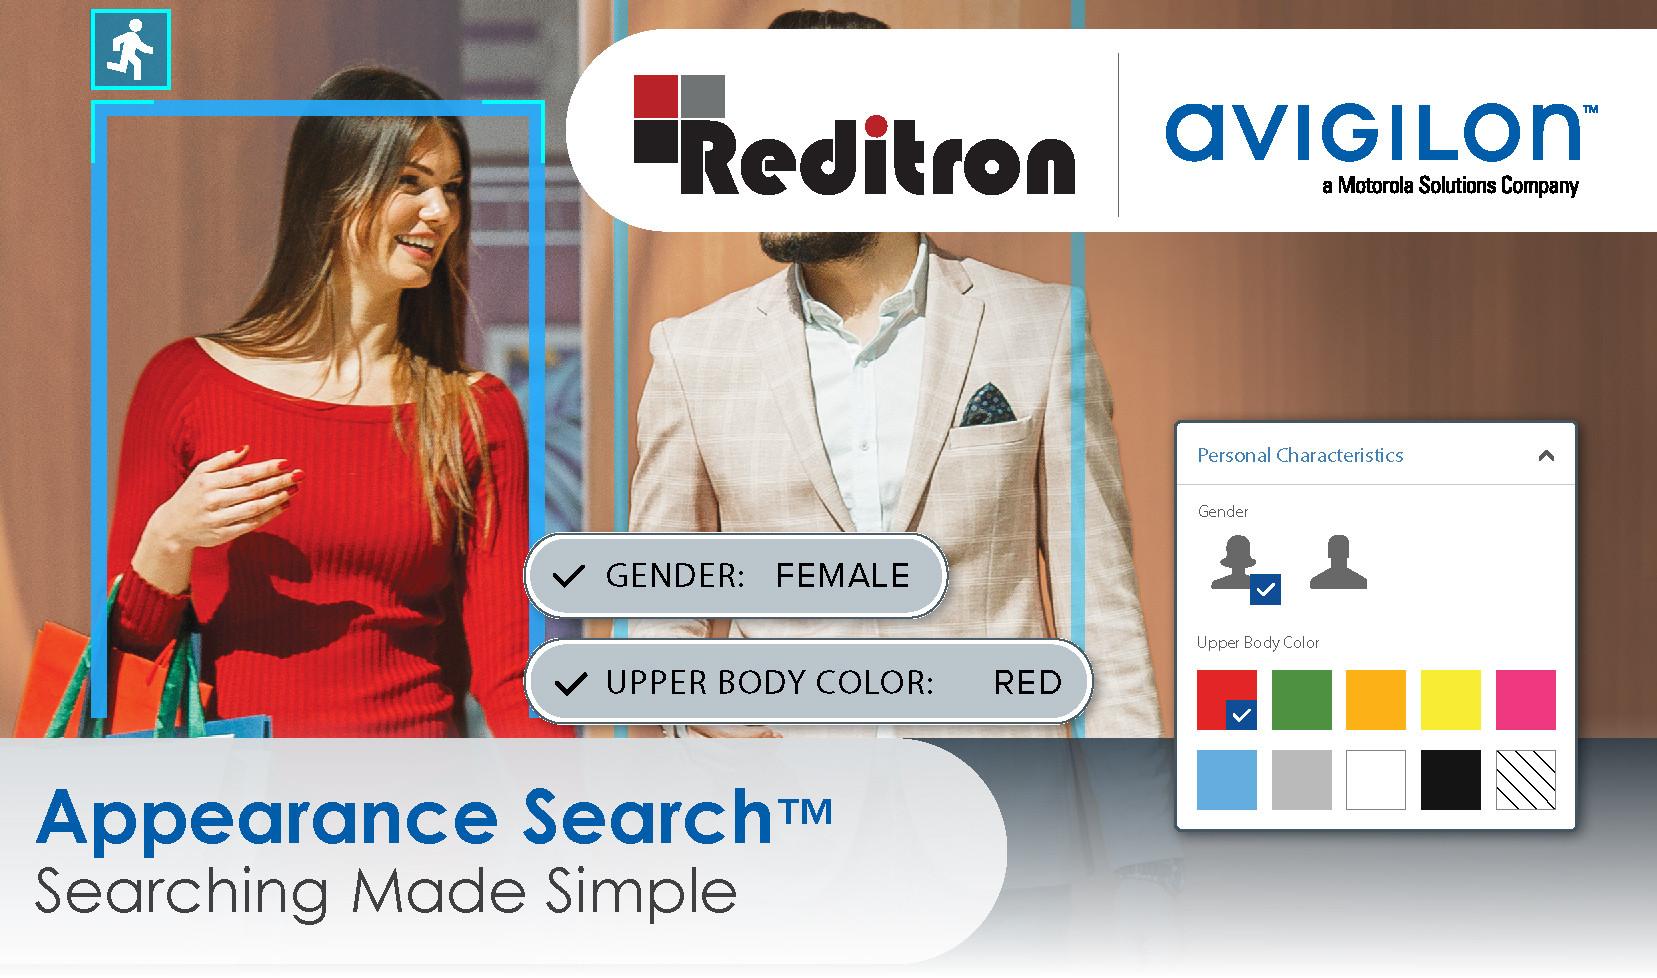 Avigilon-Appearance-Searche%20mail%20CS6-02.jpg